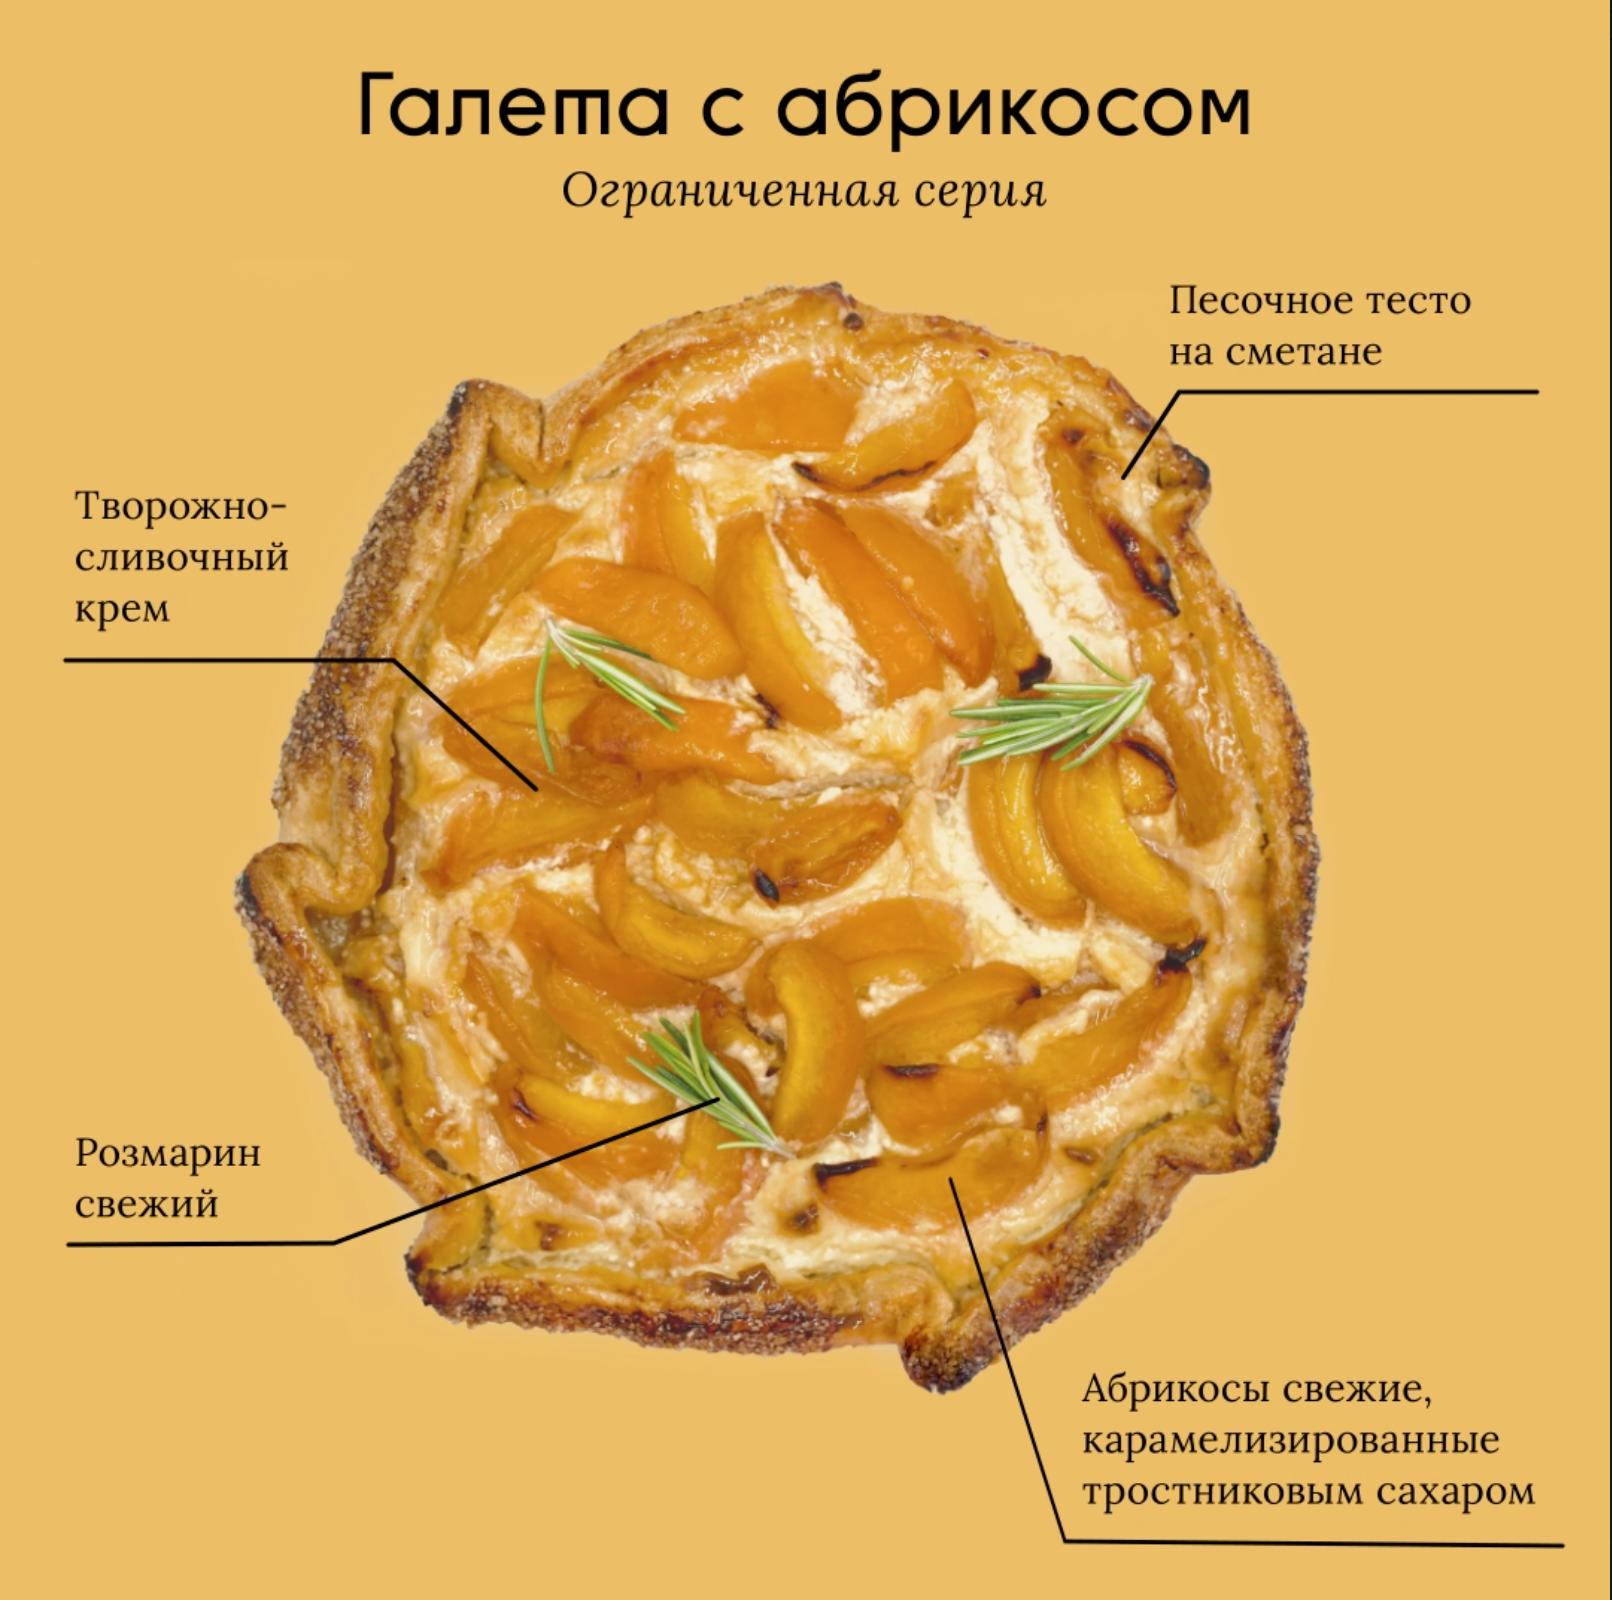 Лимитированная новинка – Галета с абрикосом!